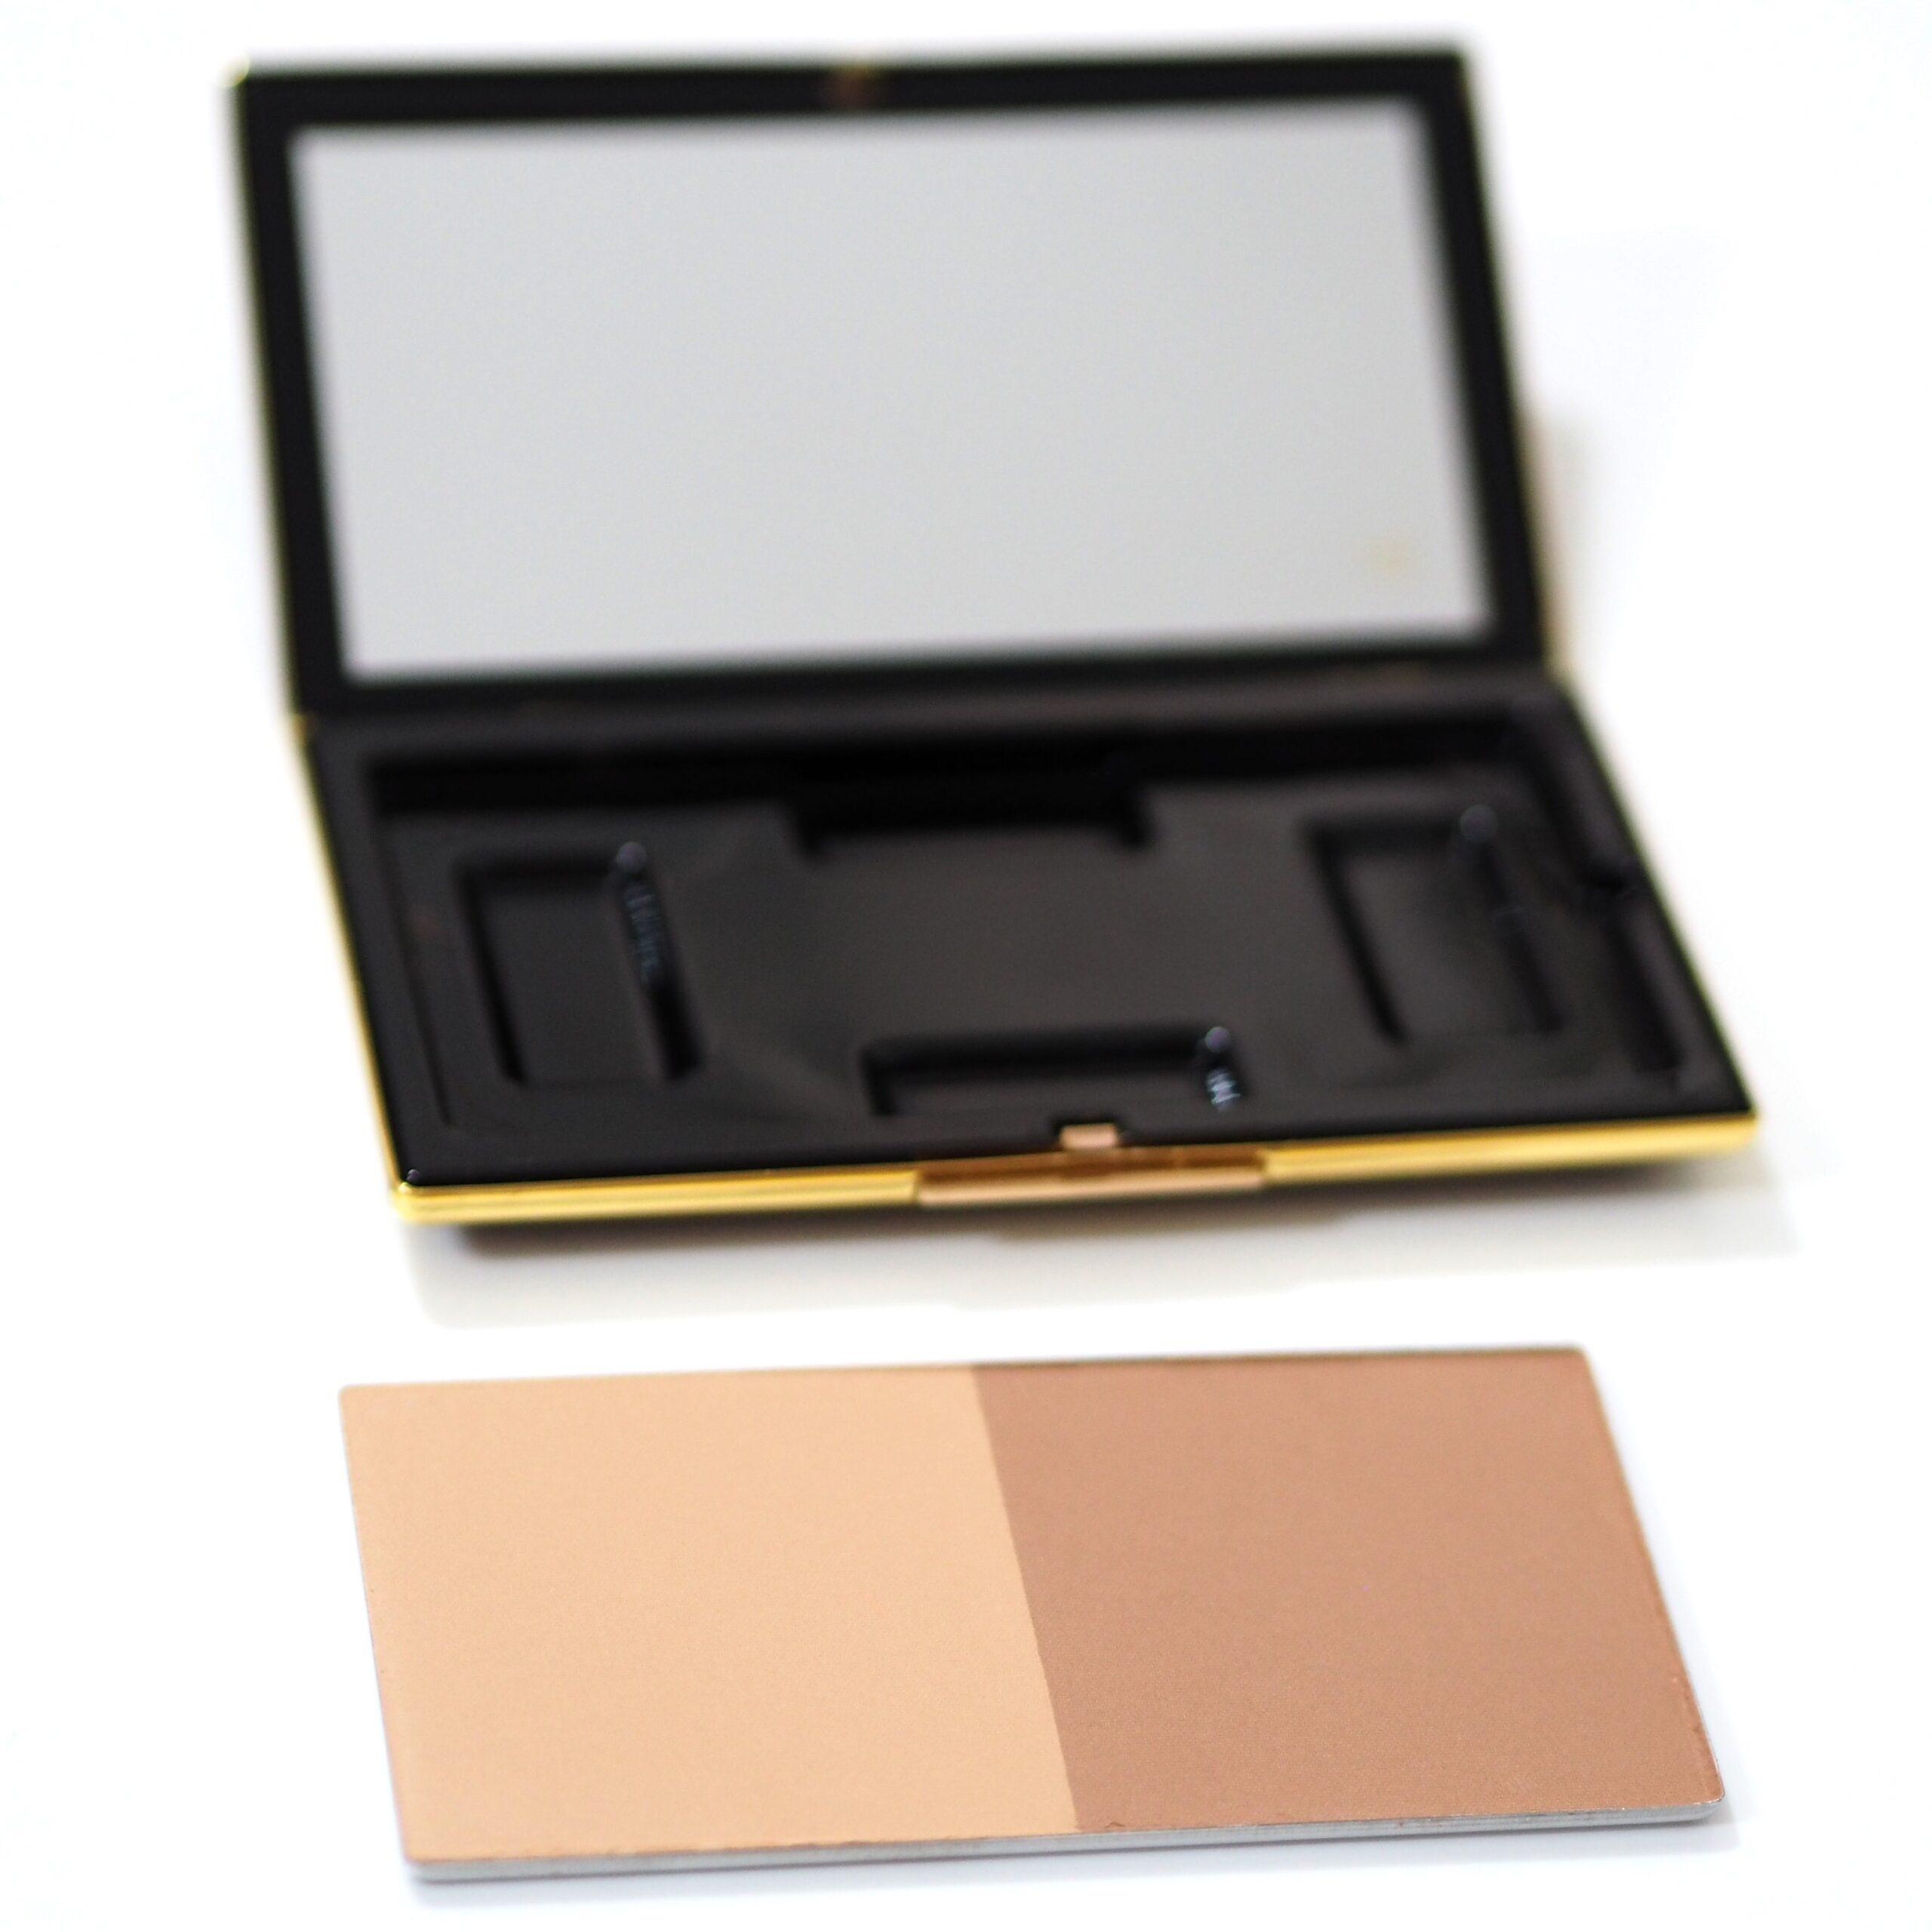 Victoria Beckham Beauty Matte Bronzing Brick Review / Swatches